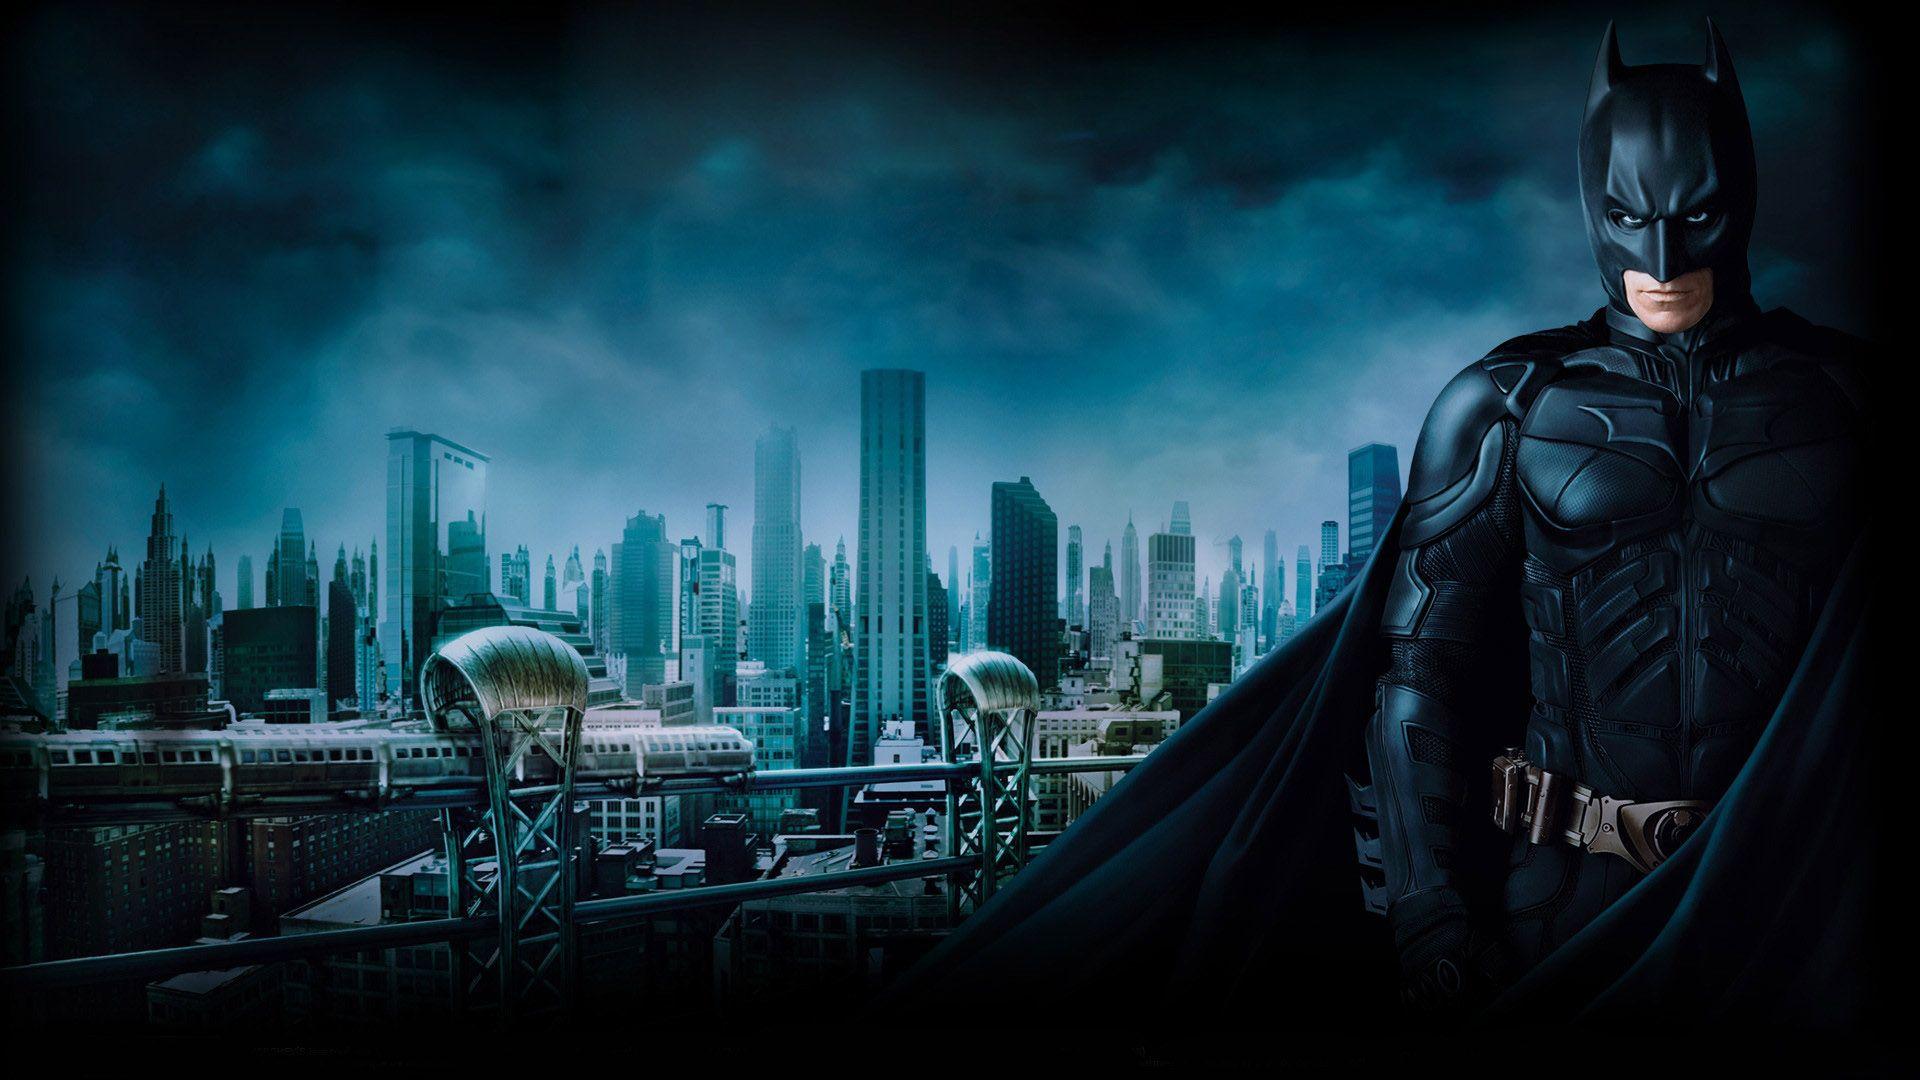 Batman The Dark Knight Epic Movie HD Wallpaper